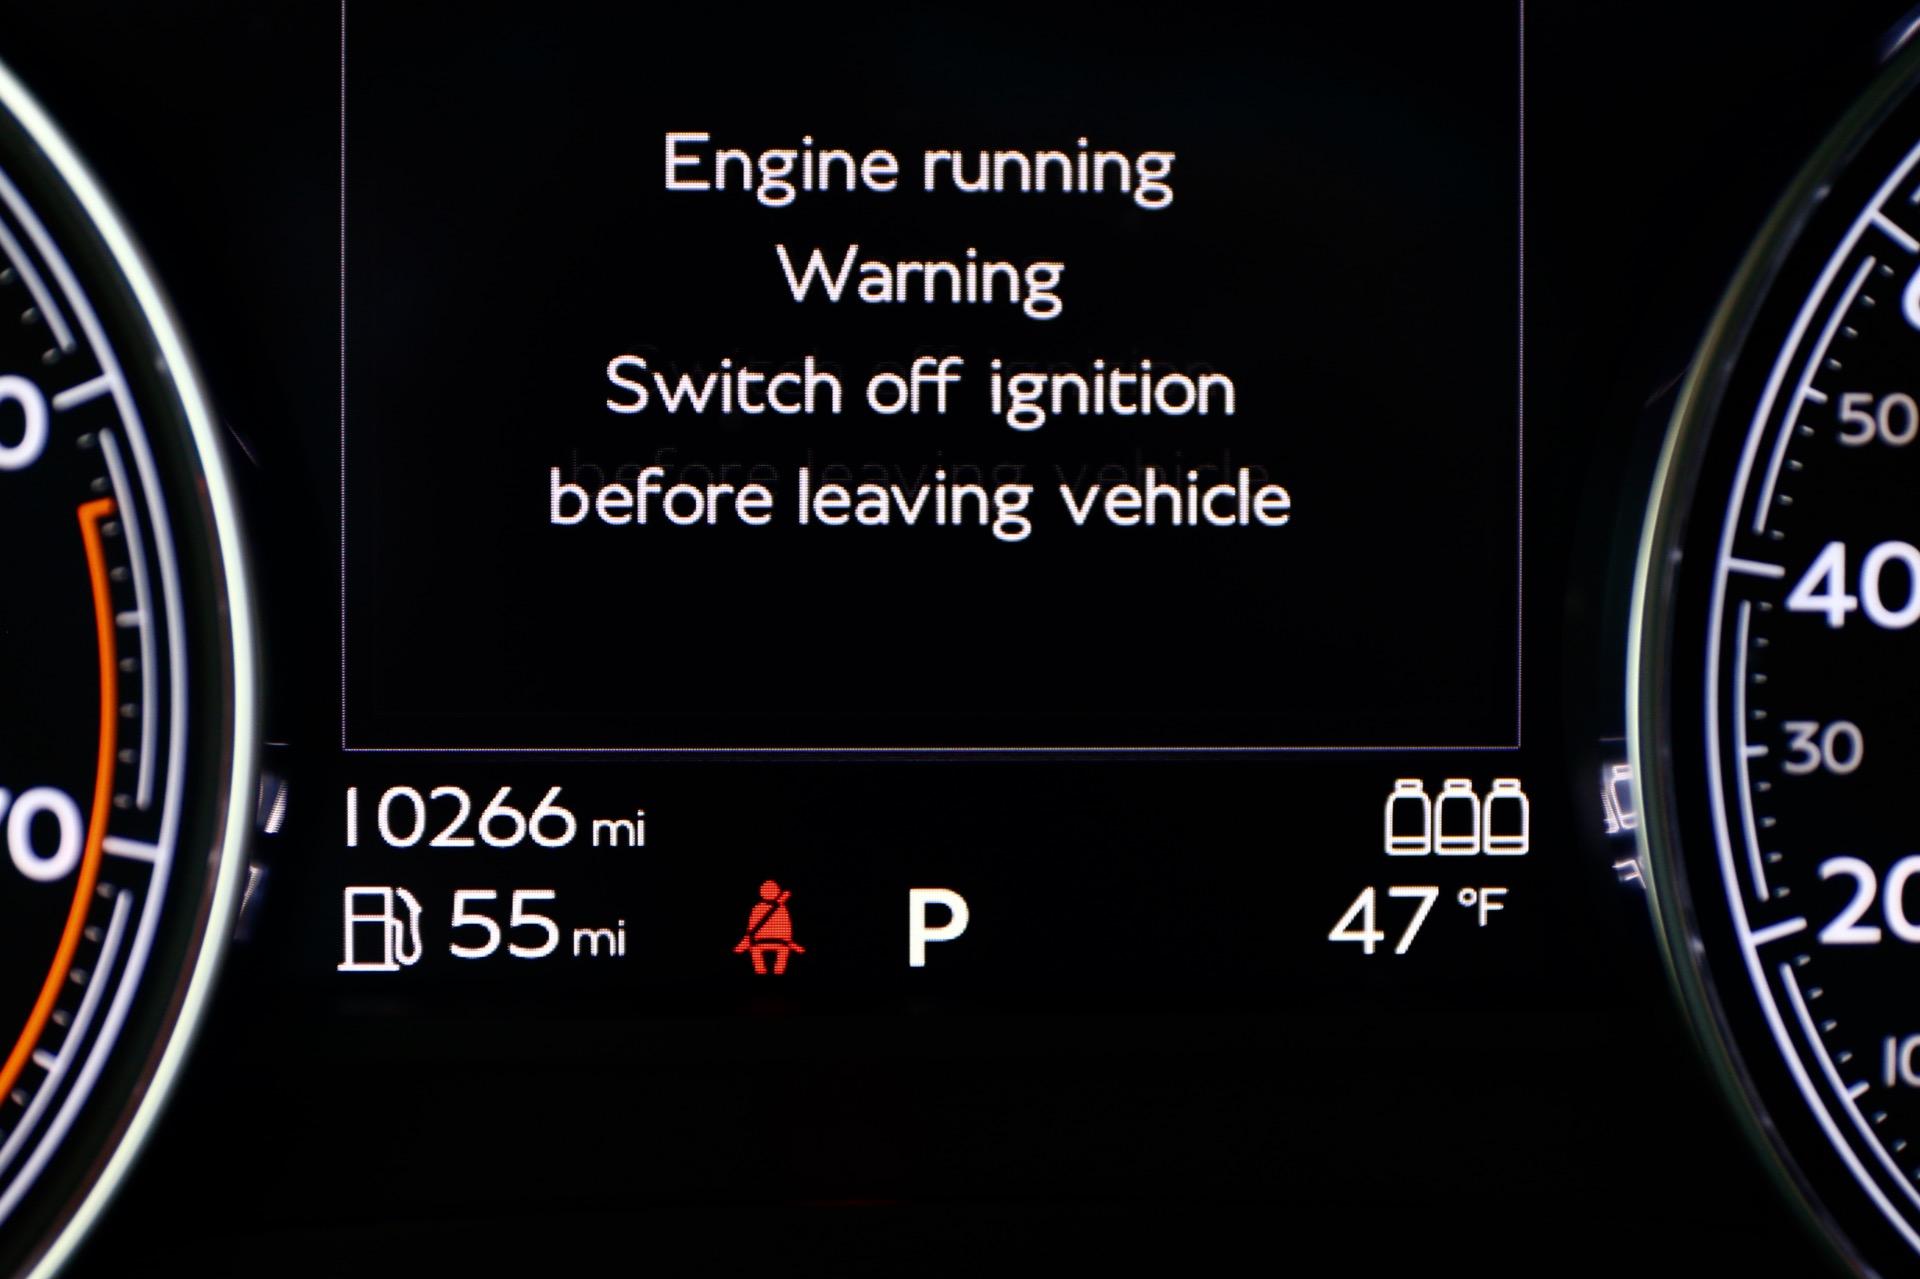 2017 Bentley Bentayga Stock Pa77687a For Sale Near Vienna Va Automatic Headlight Reminder Used